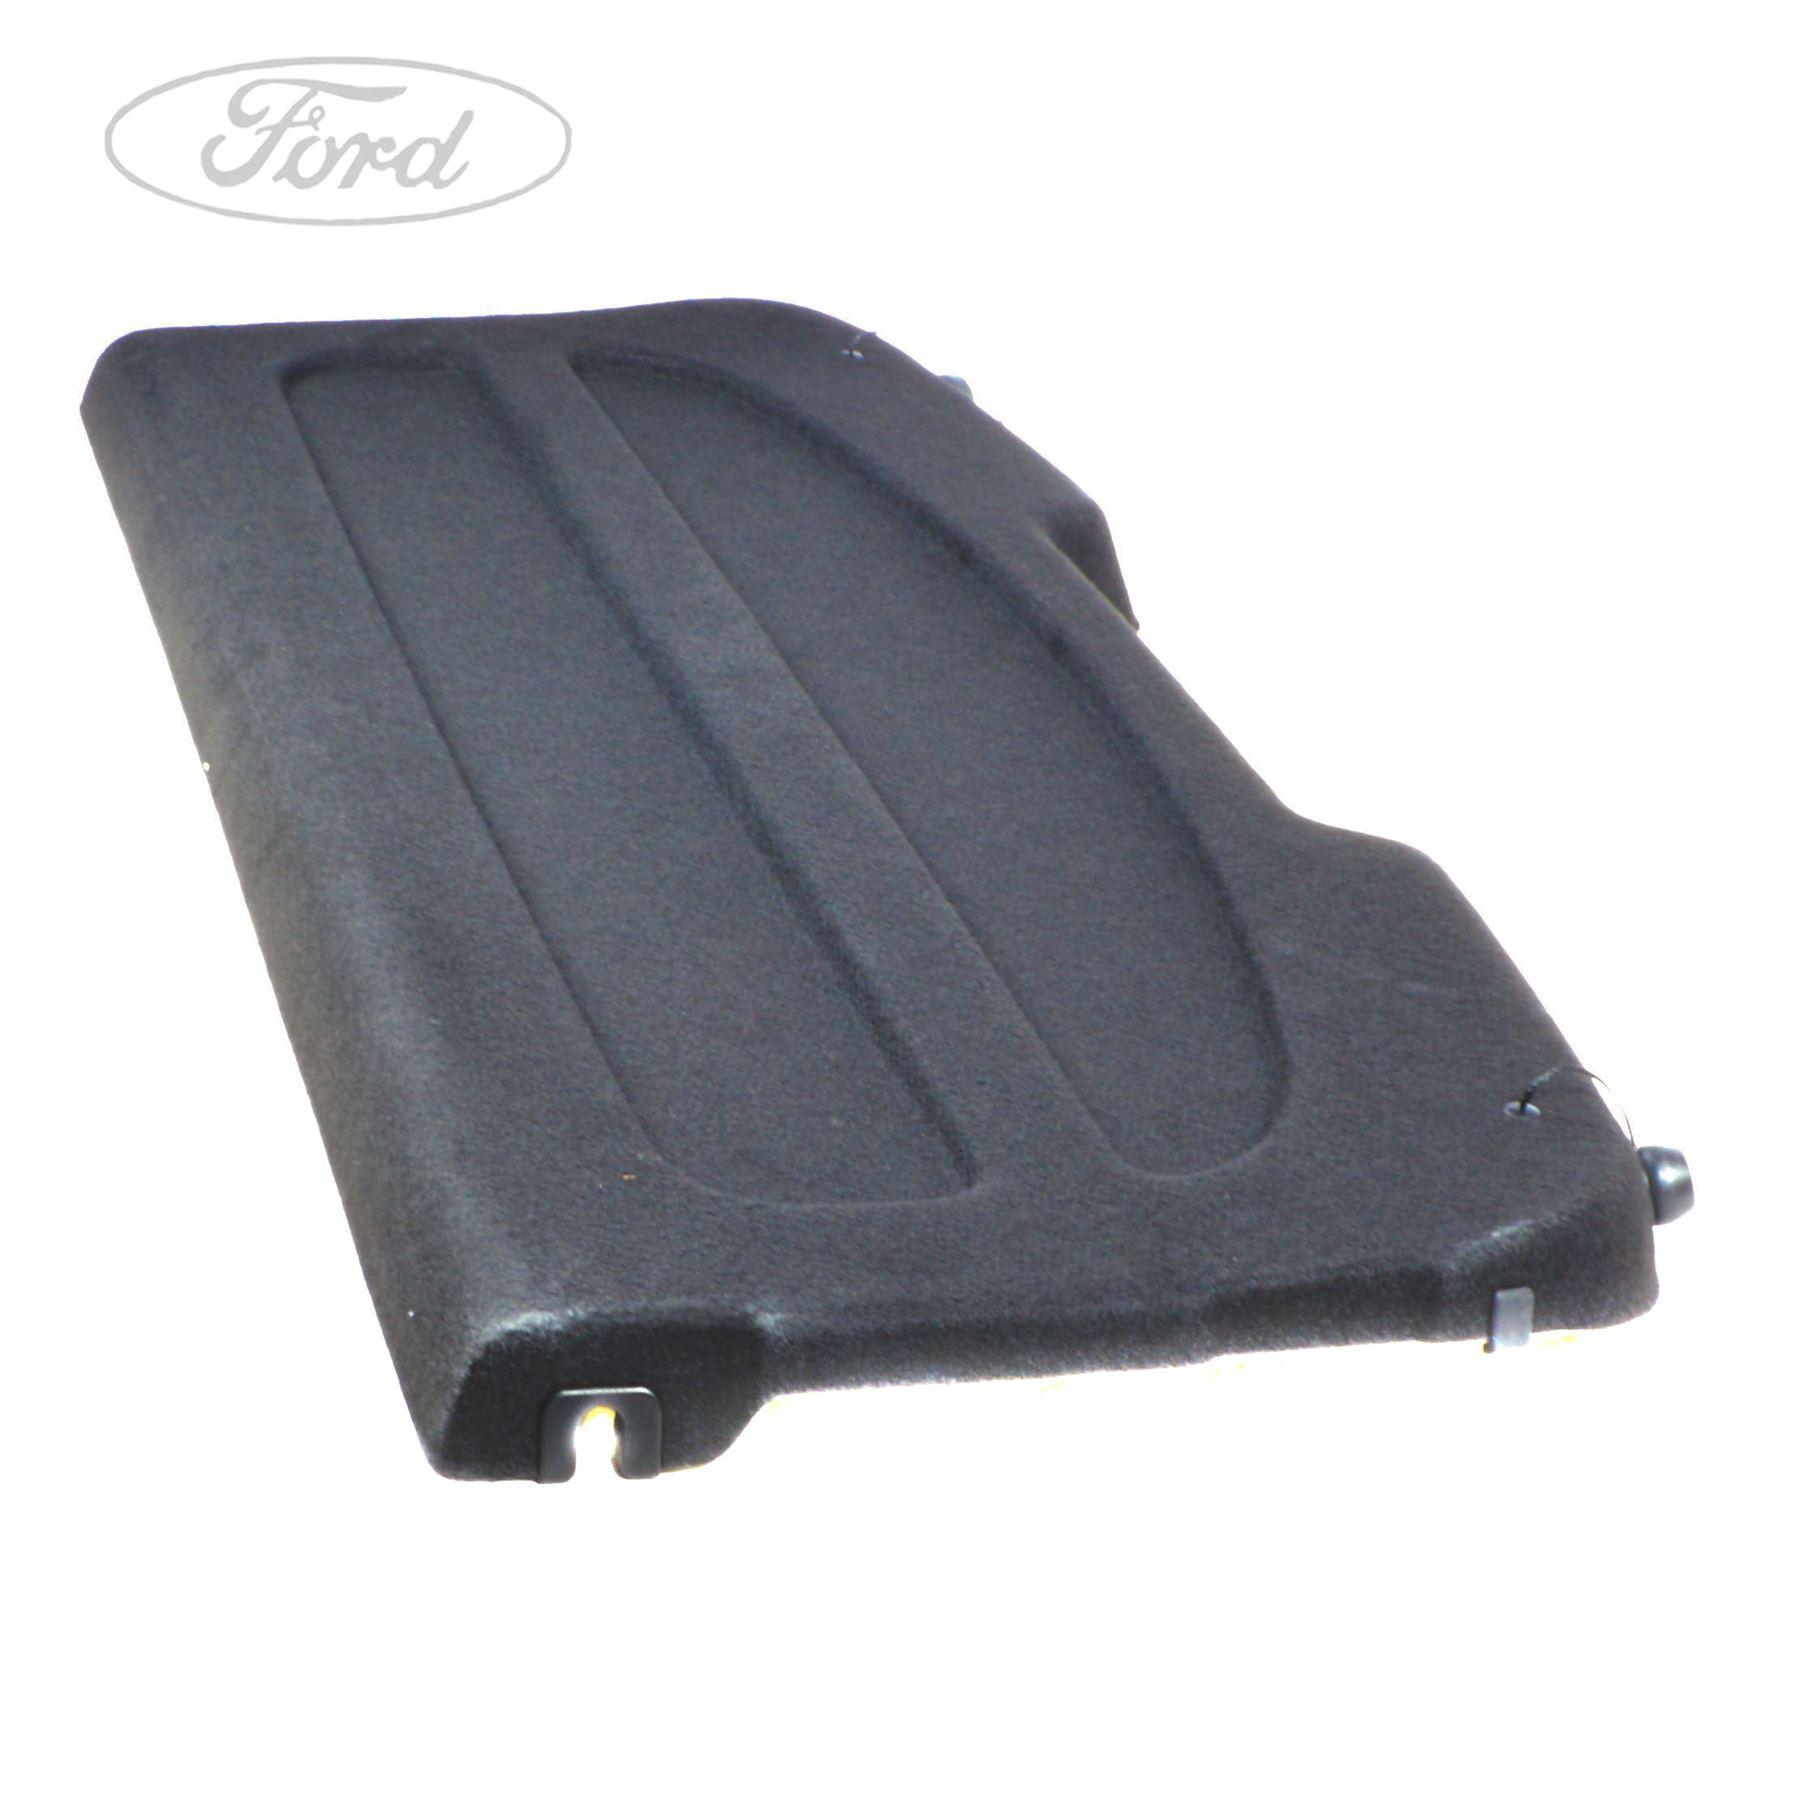 Genuine Ford Fiesta MK8 Rear Parcel Shelf Package Tray Trim Panel 2015-1942136